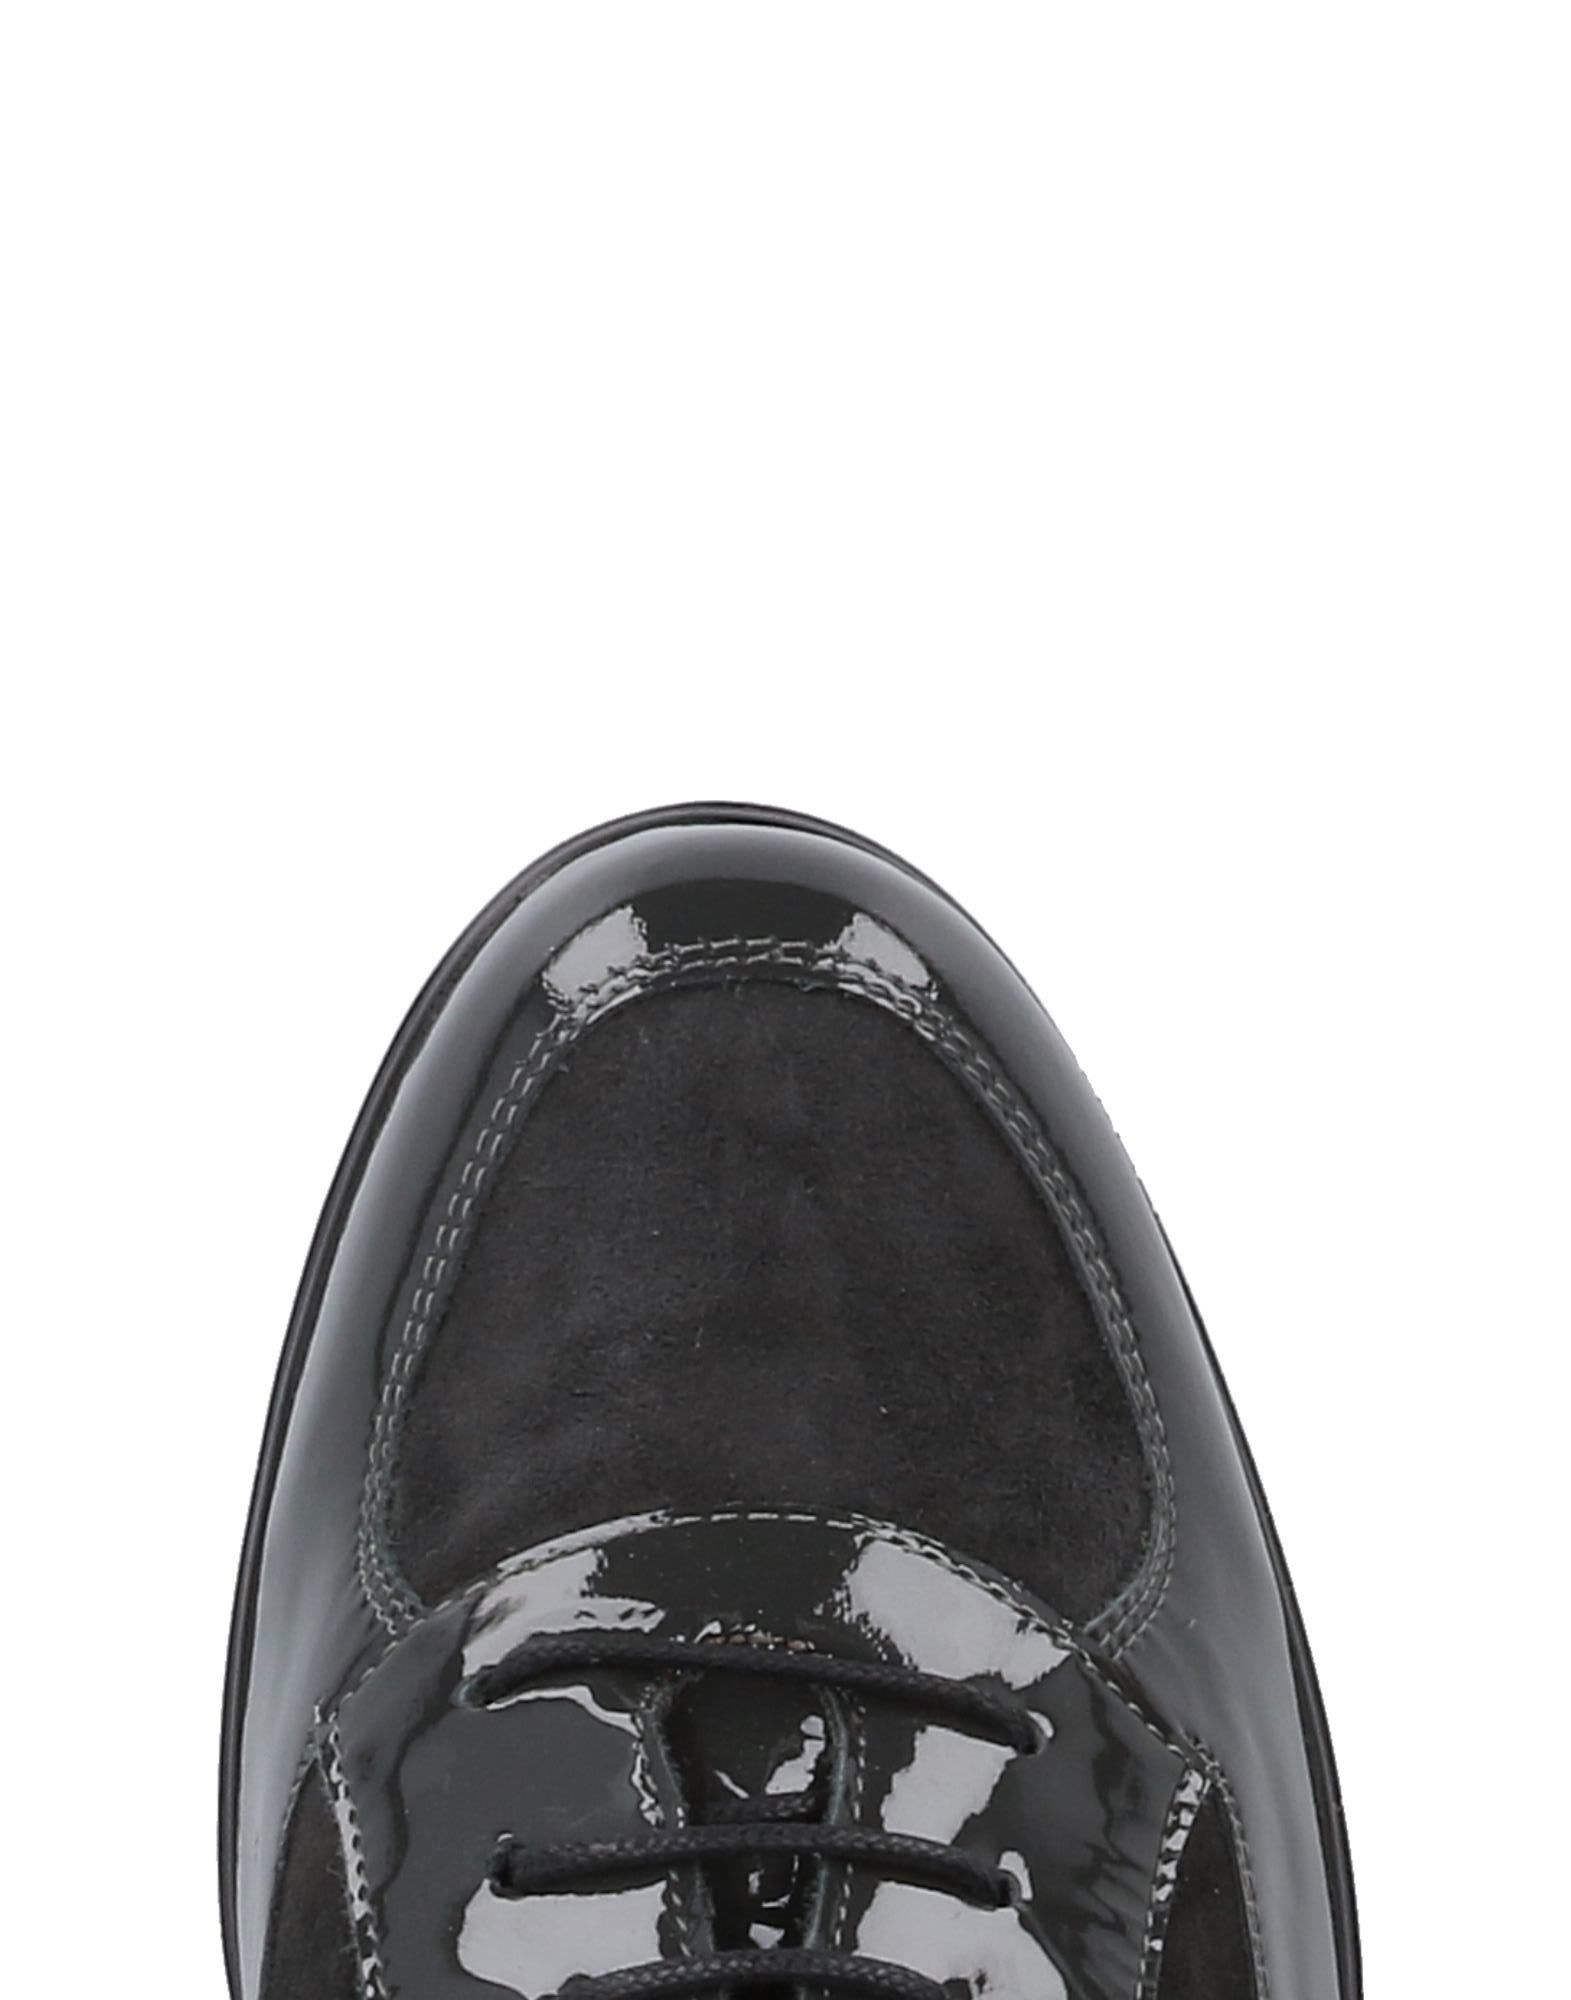 Valleverde Gute Sneakers Damen  11467656VF Gute Valleverde Qualität beliebte Schuhe fee0d0